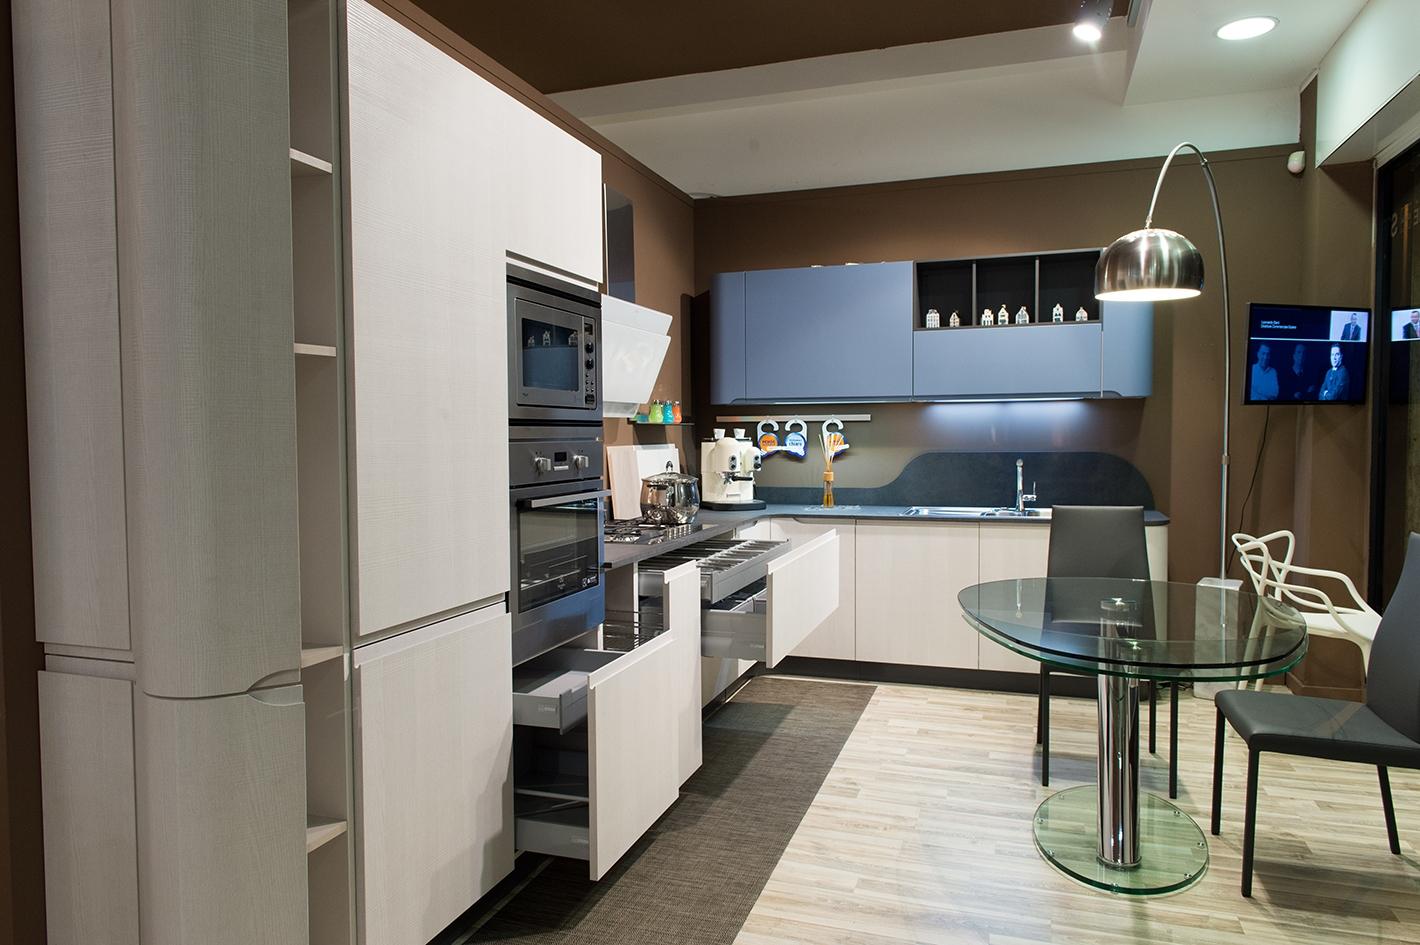 Stosa cucine cucina bring moderna laminato materico bianca cucine a prezzi scontati - Altezza cucina stosa ...